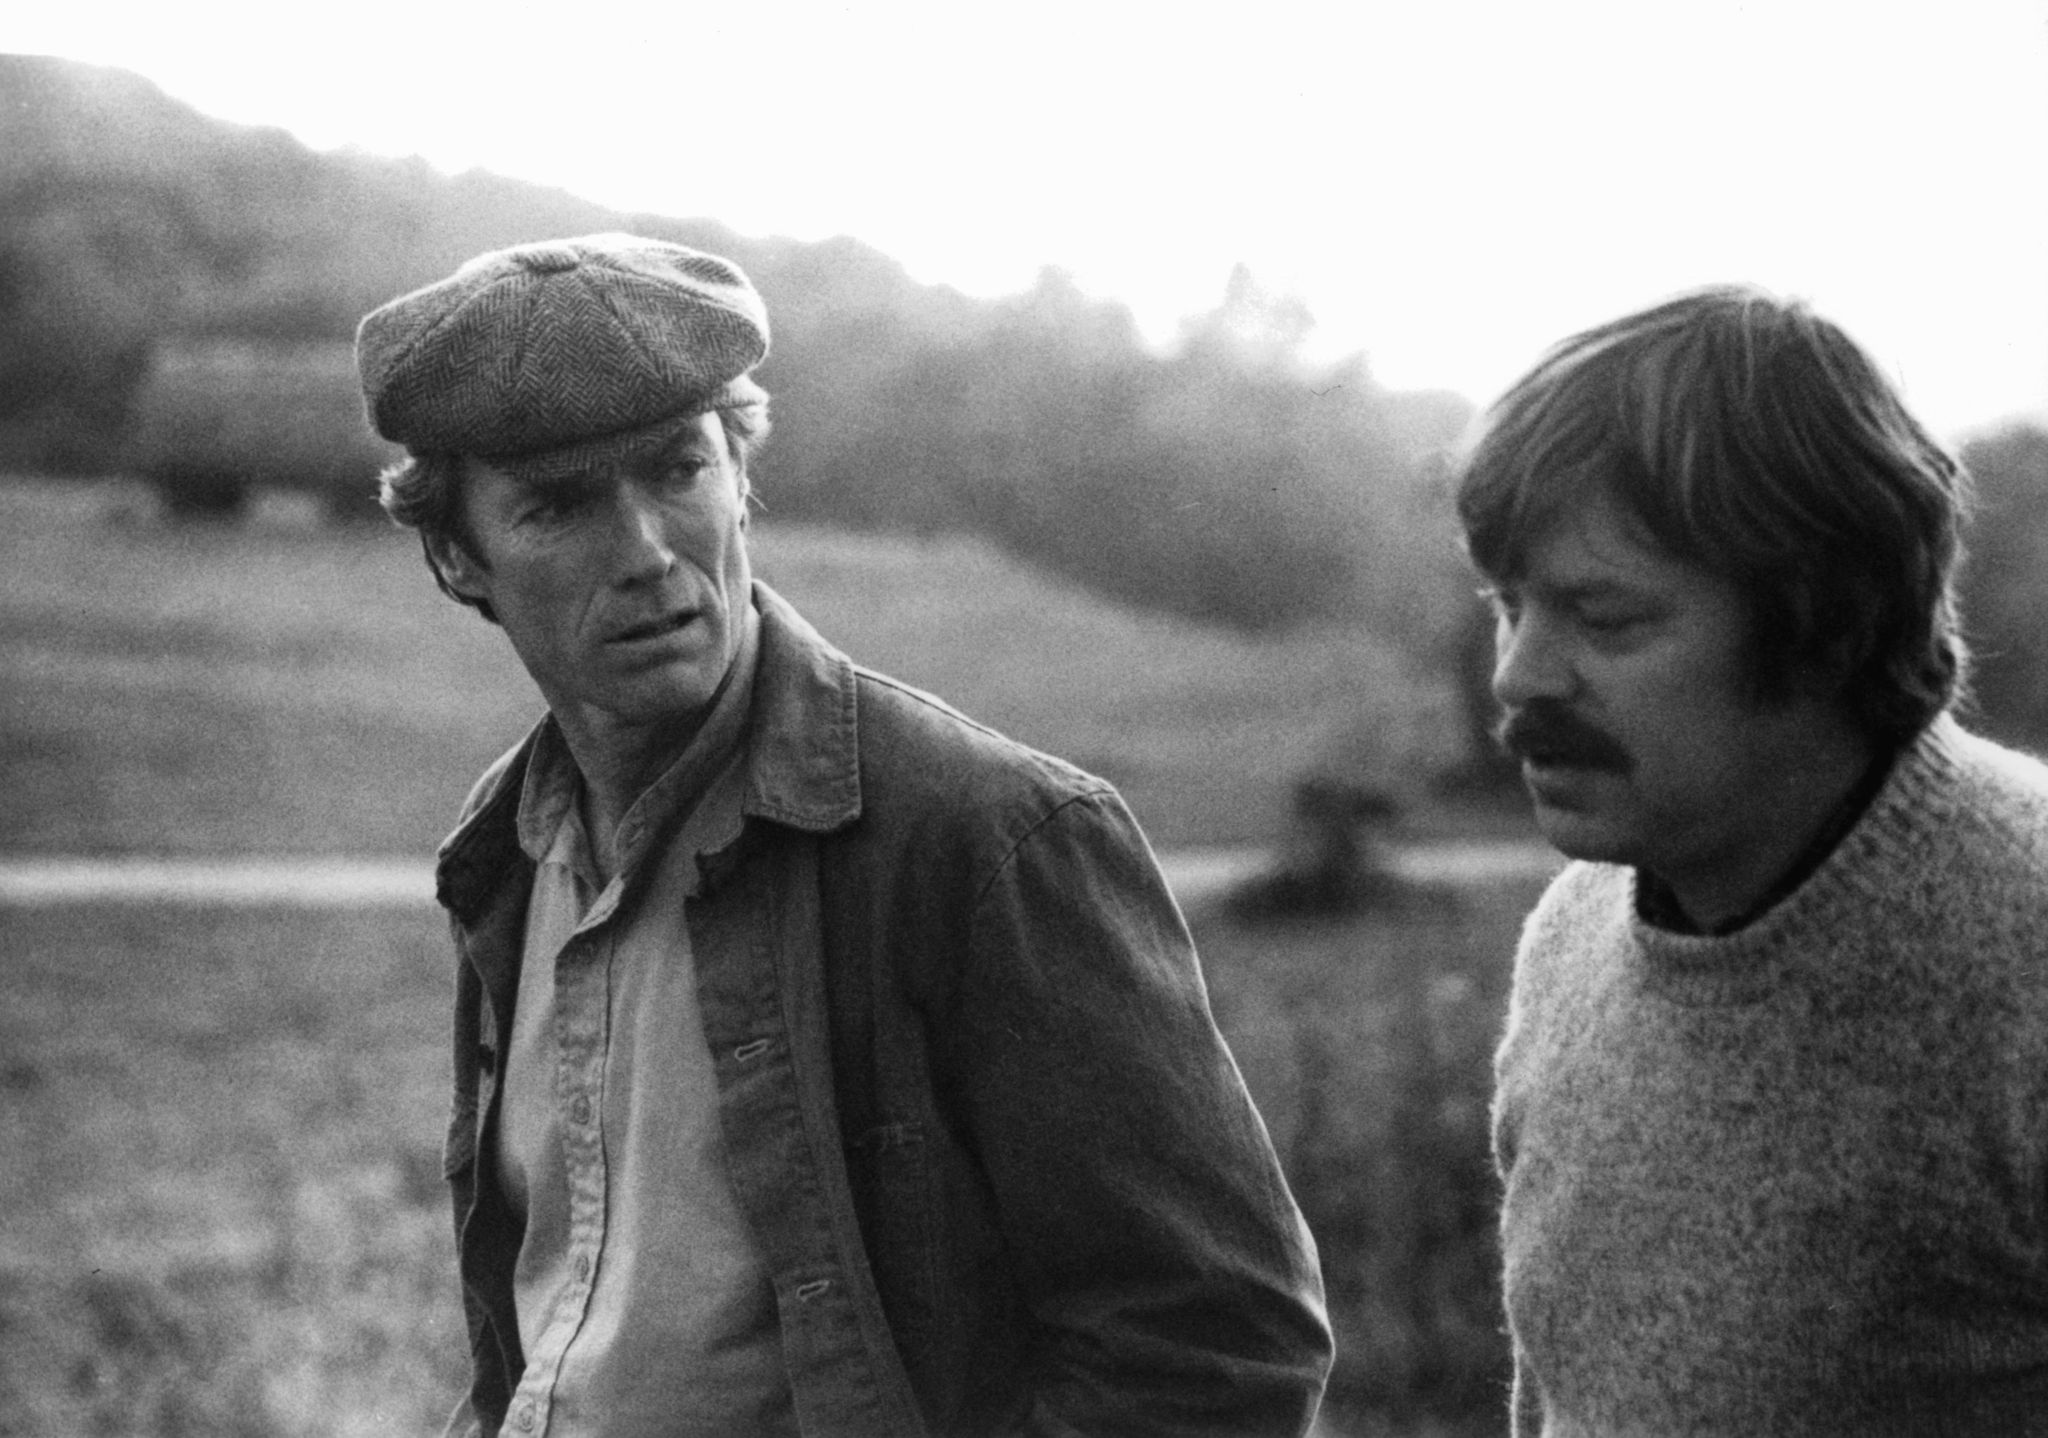 MV5BMTYzMDQ4MzY1OV5BMl5BanBnXkFtZTcwNDYzMDgwOA@@. V1 20 Things You Probably Didn't Know About Clint Eastwood's 1982 Film Firefox